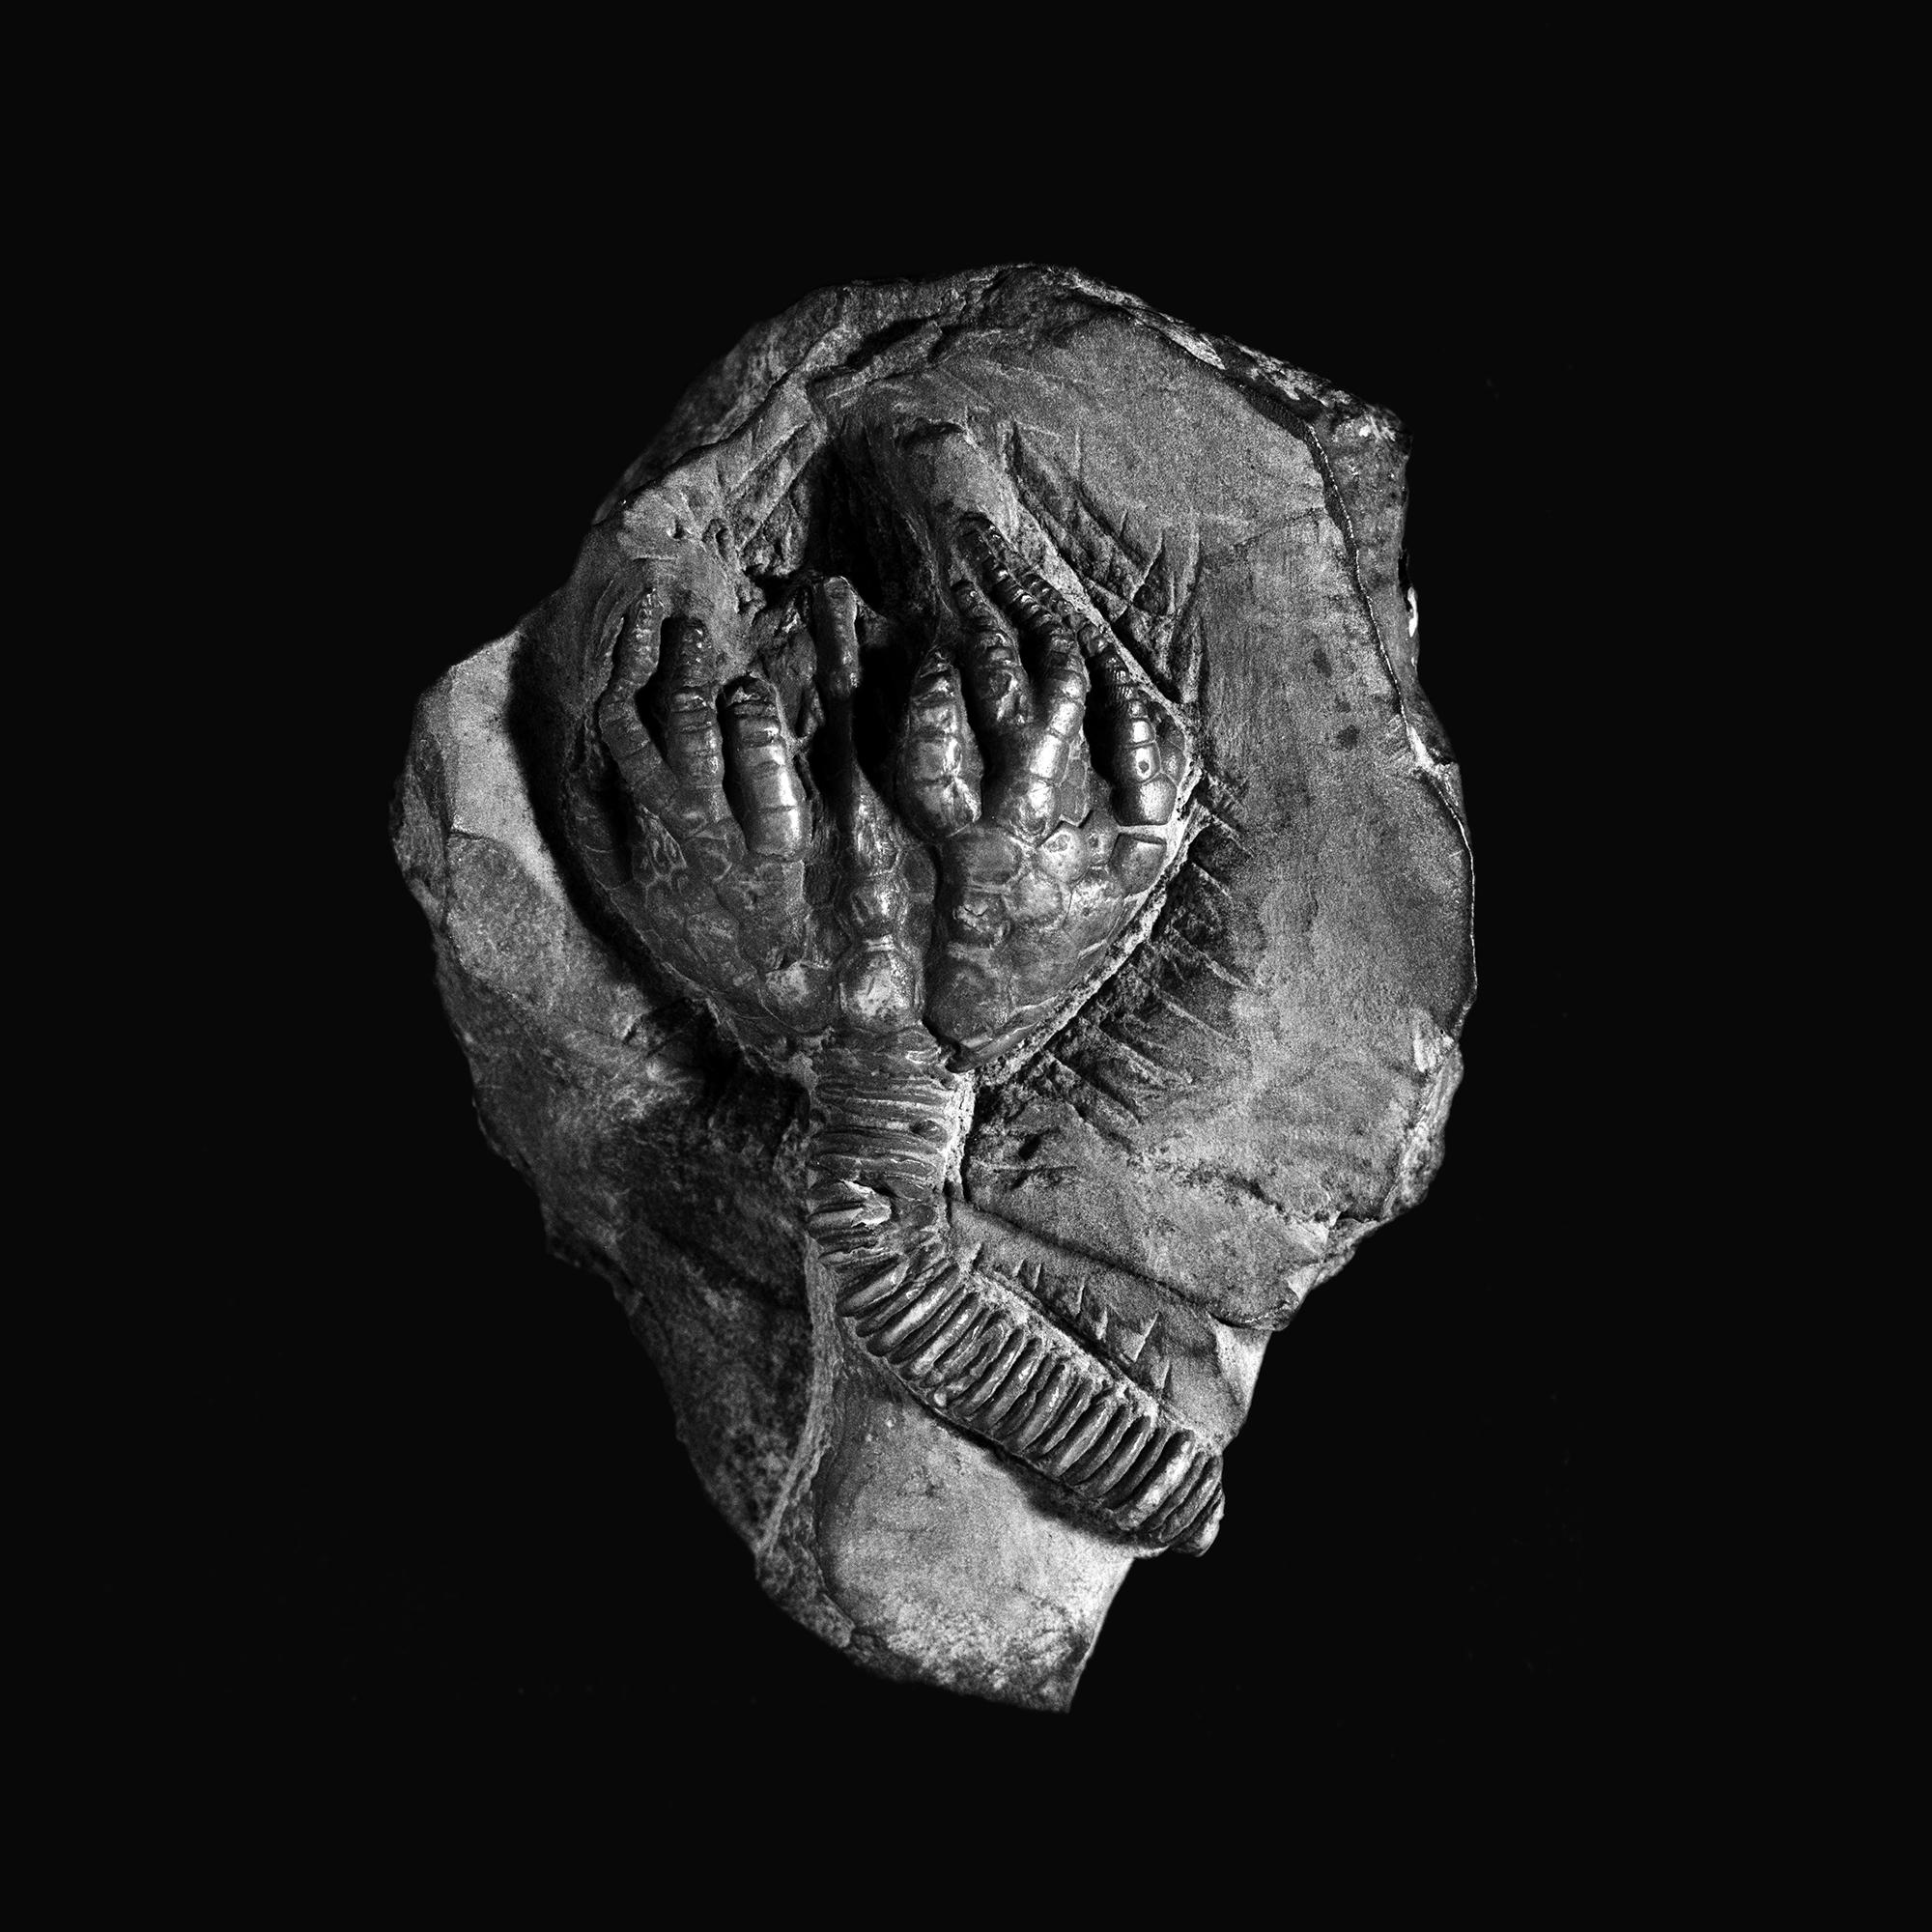 Desmidocrinus n. sp. Ober-Silur, Wenlock, Limestone, Dudley England